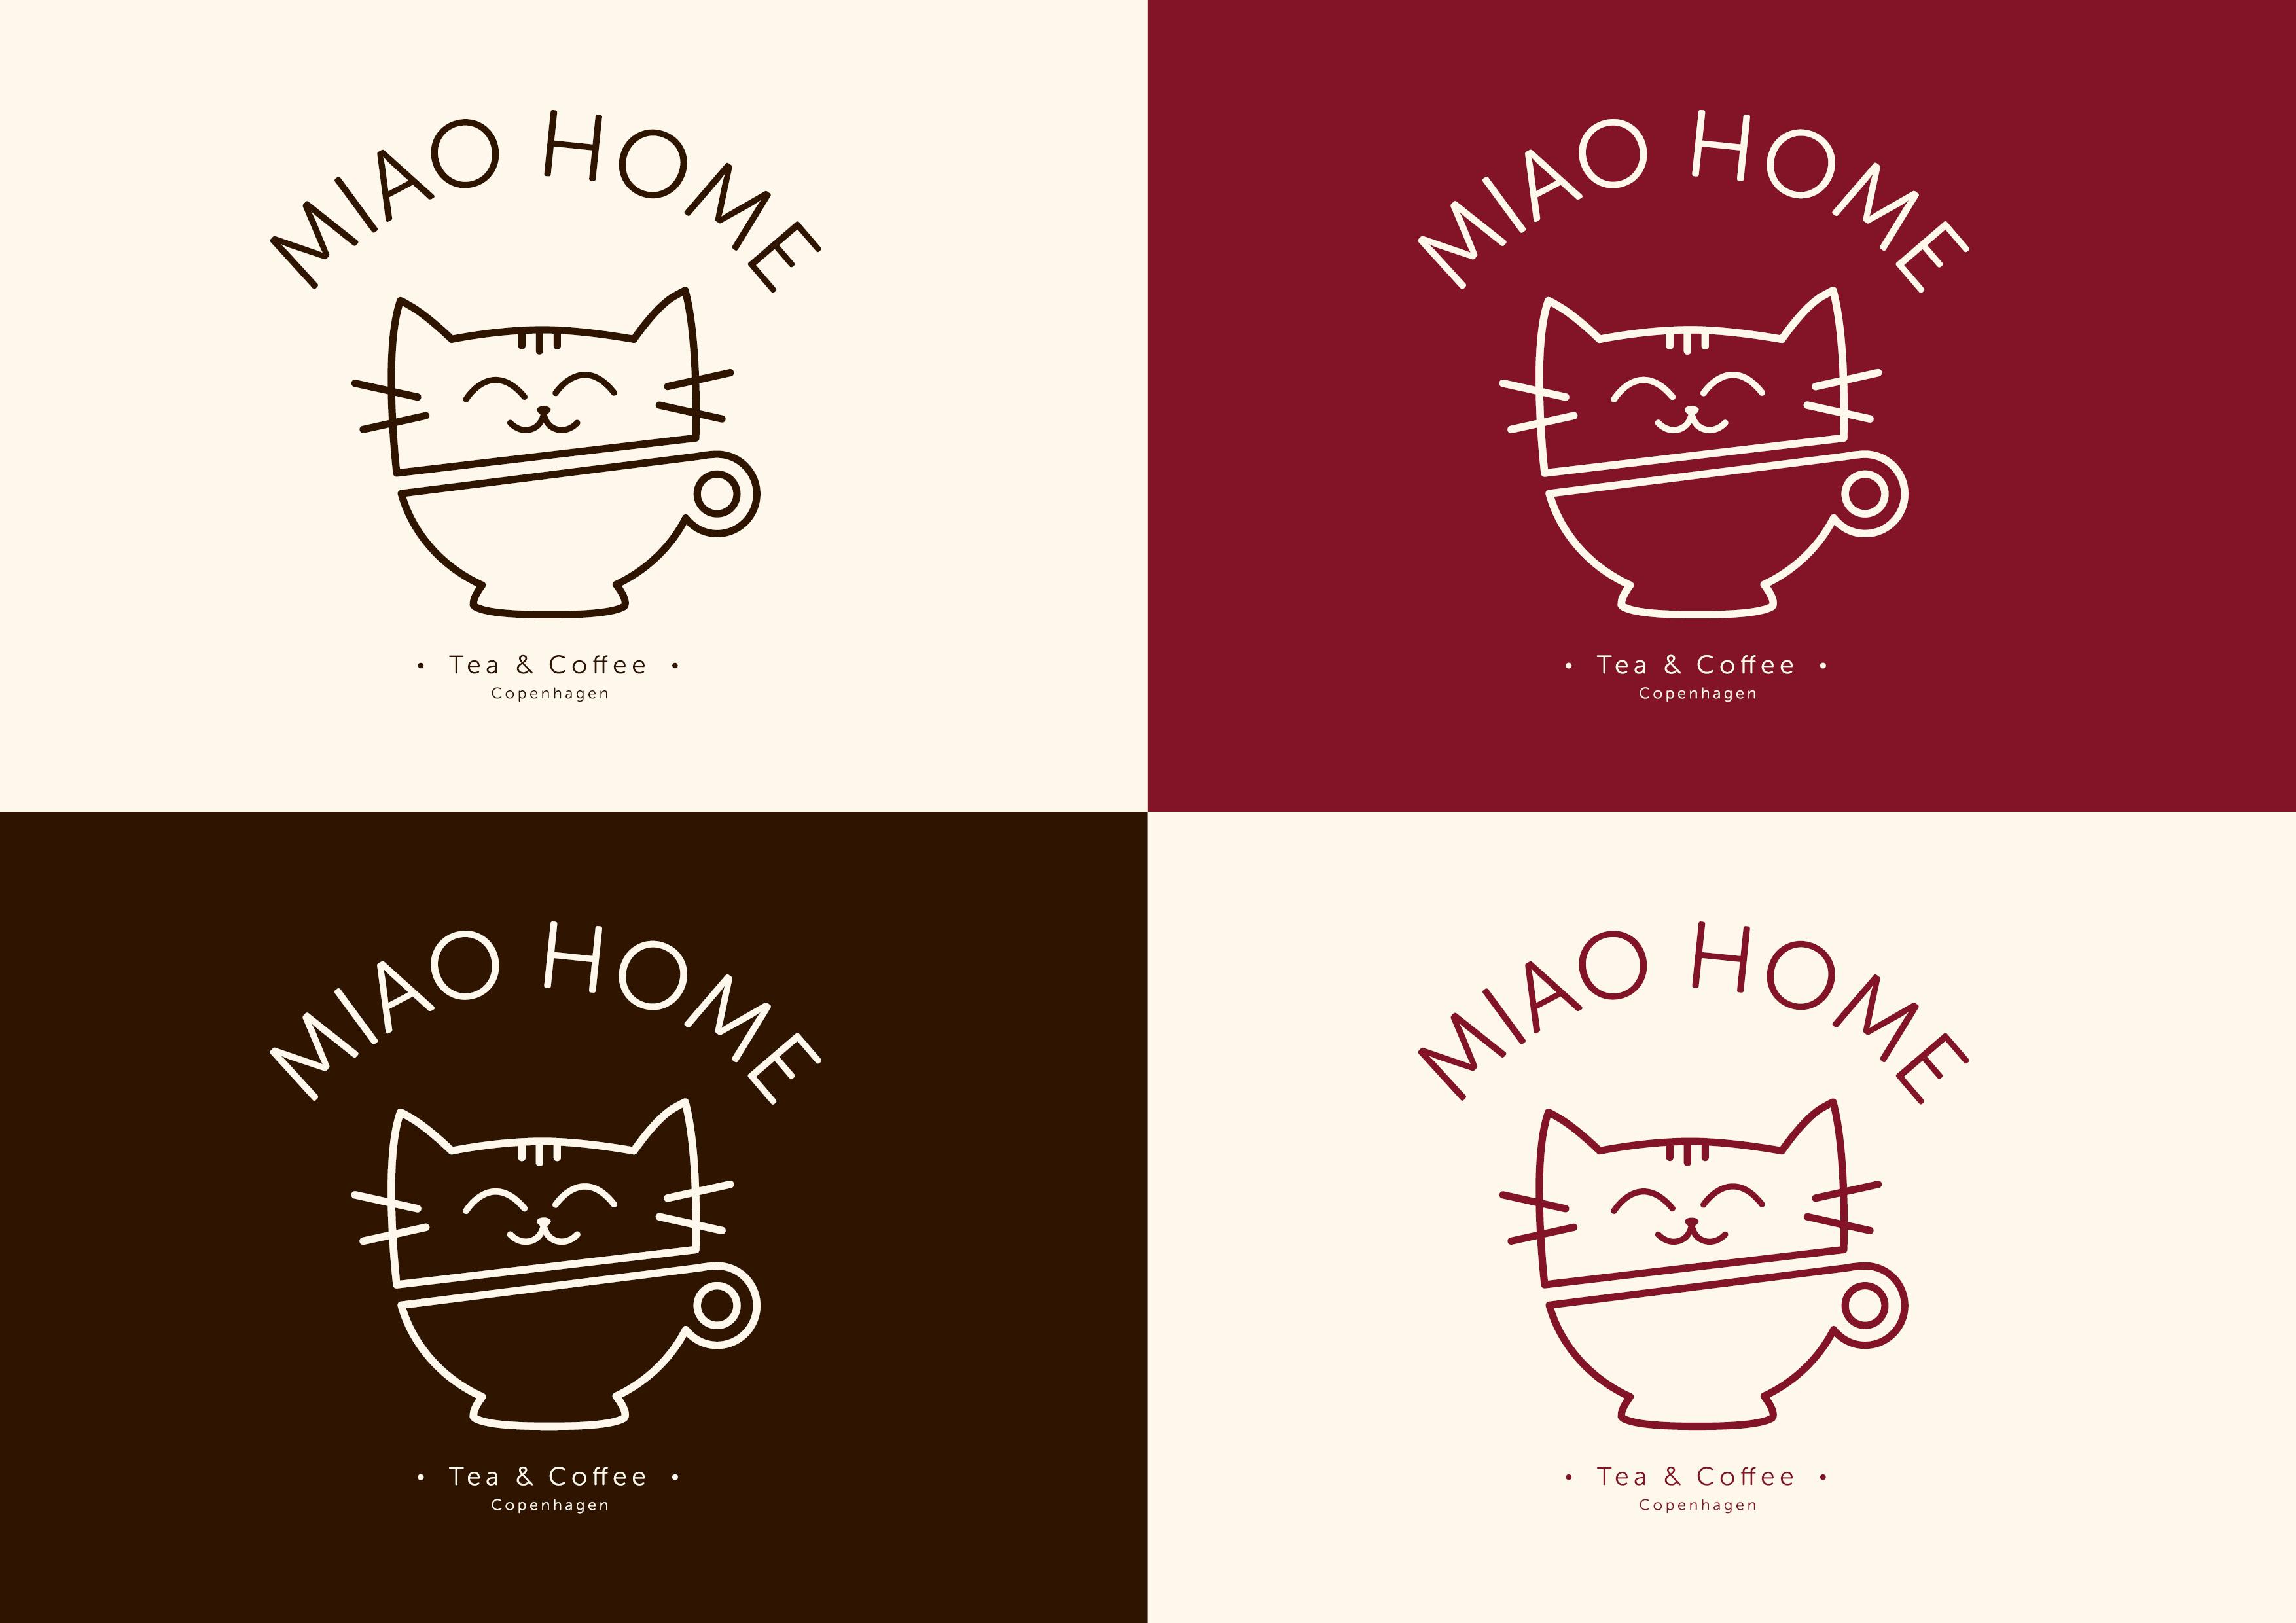 visuel08_miaohome_logo